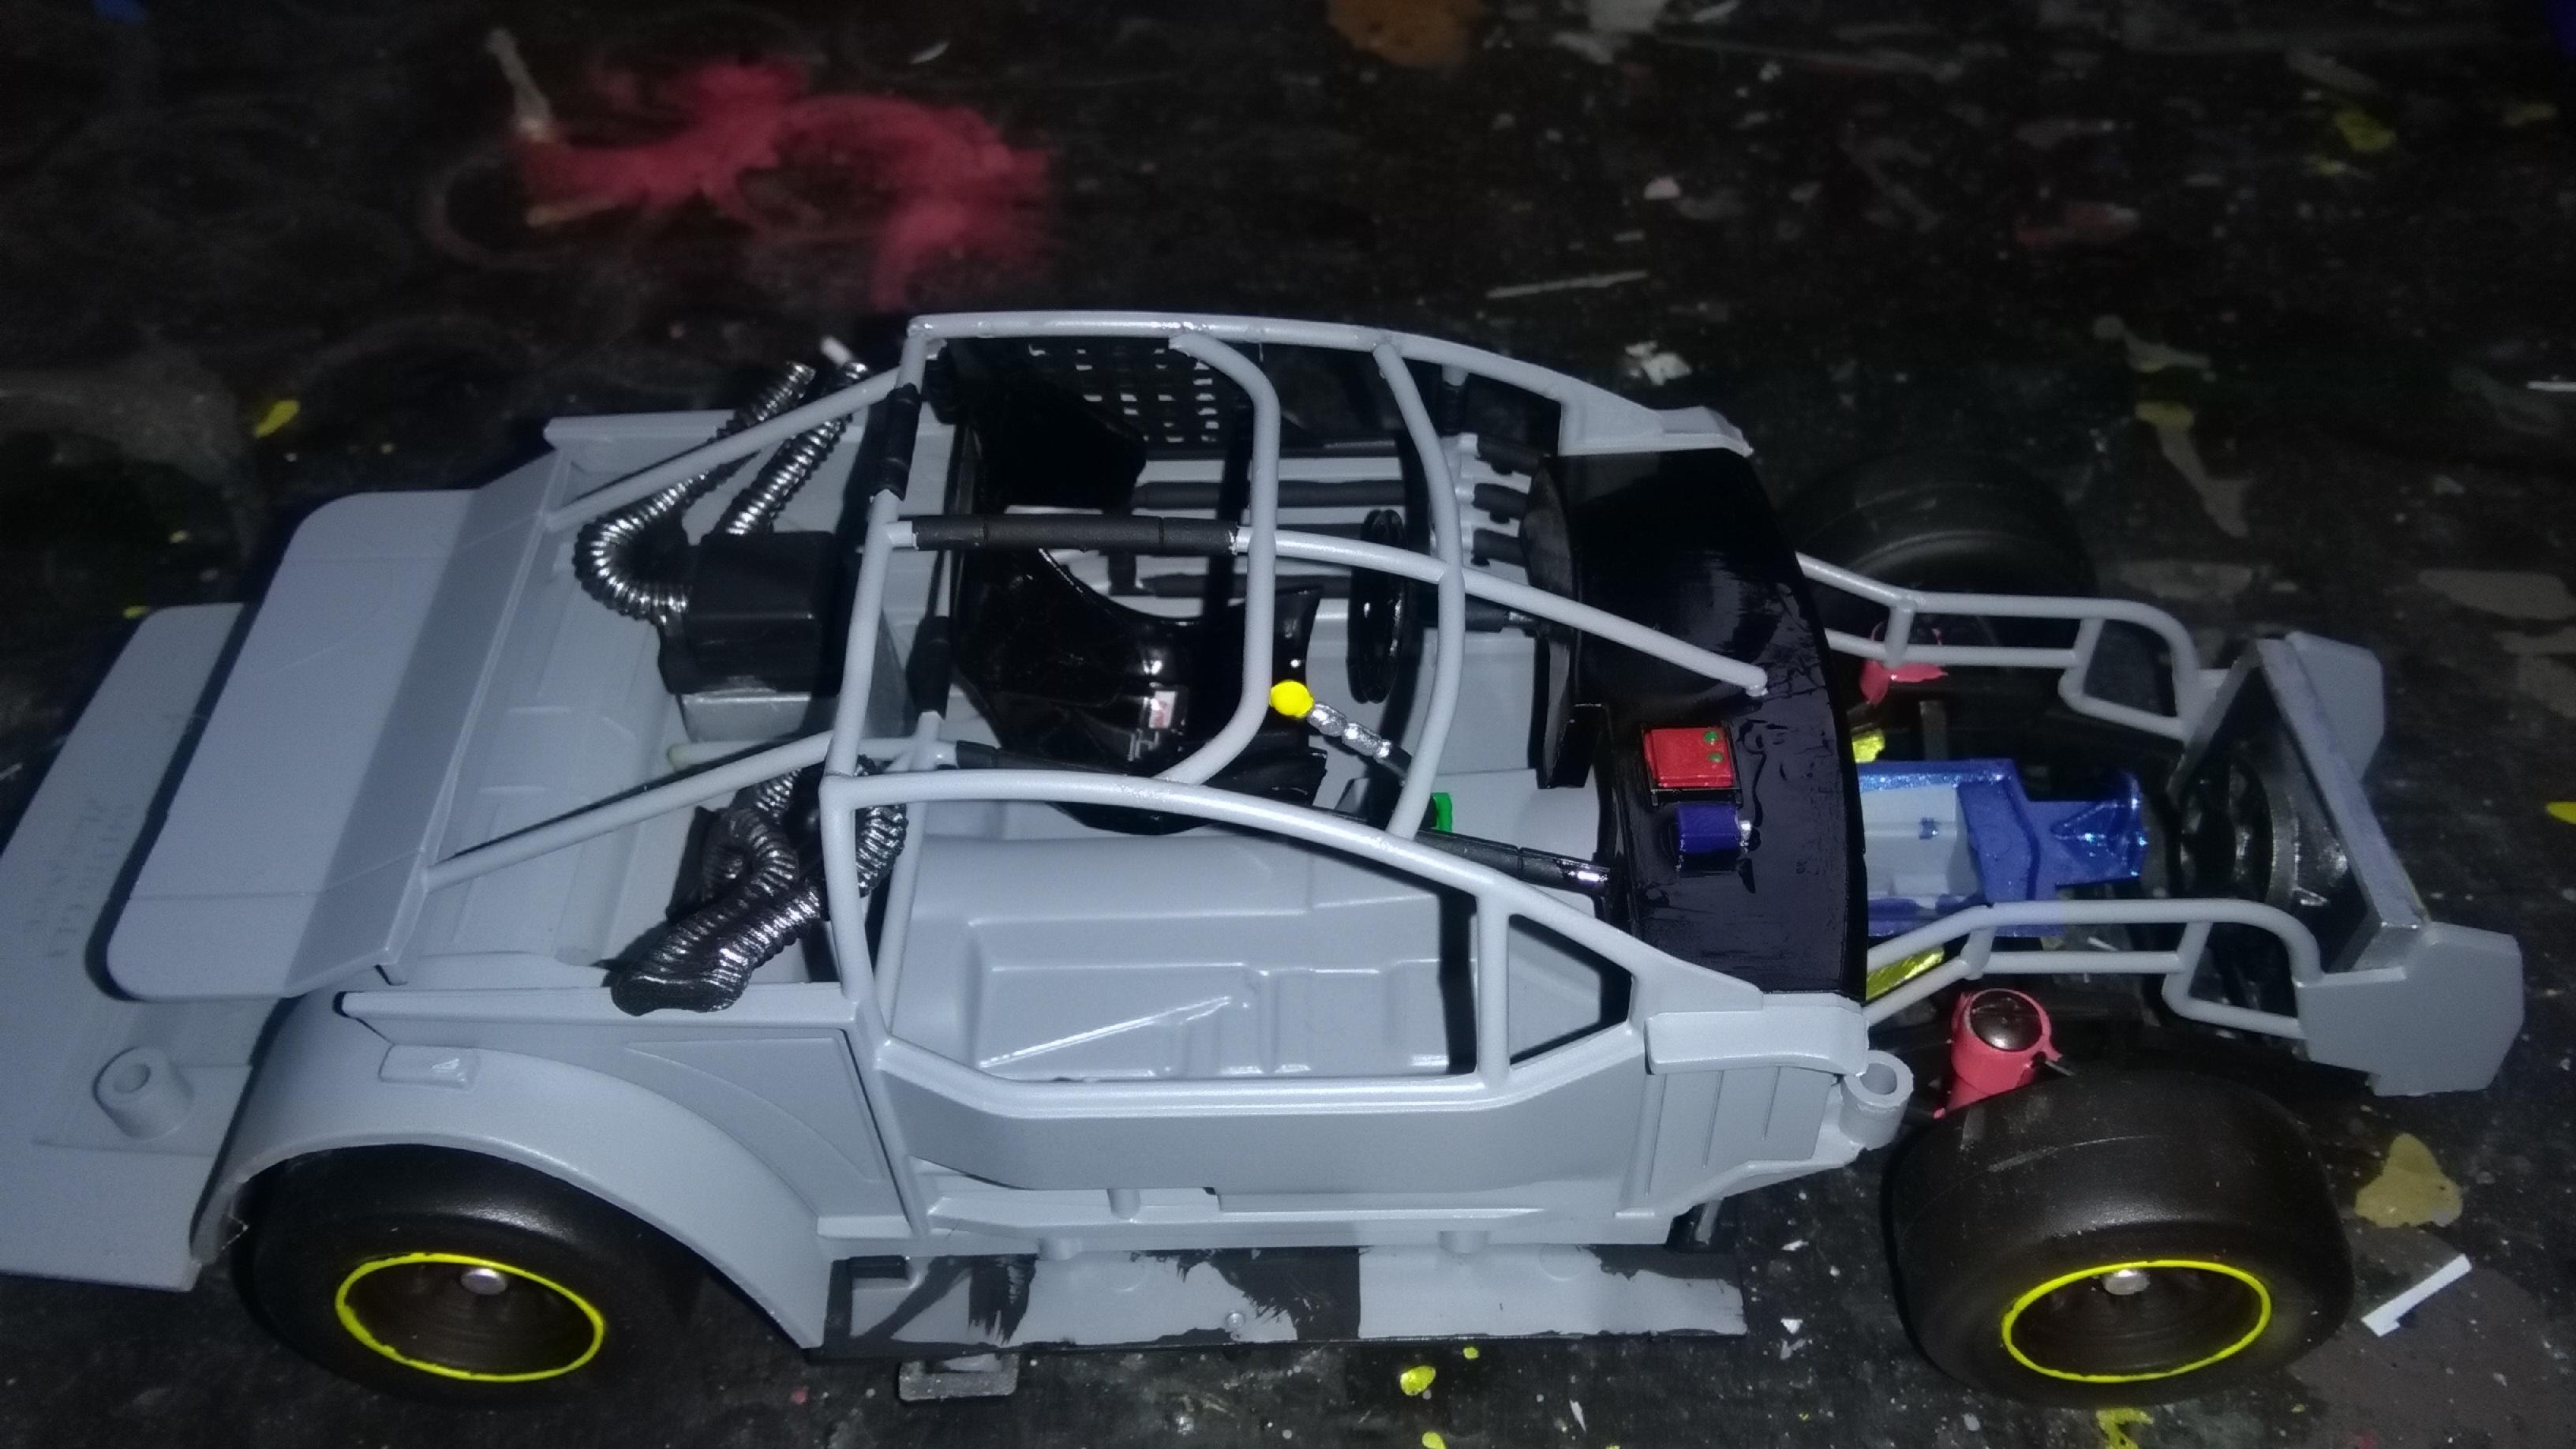 Chevrolet SS 2015 #24 Jeff Gordon 3M 933635IMG20170319171014